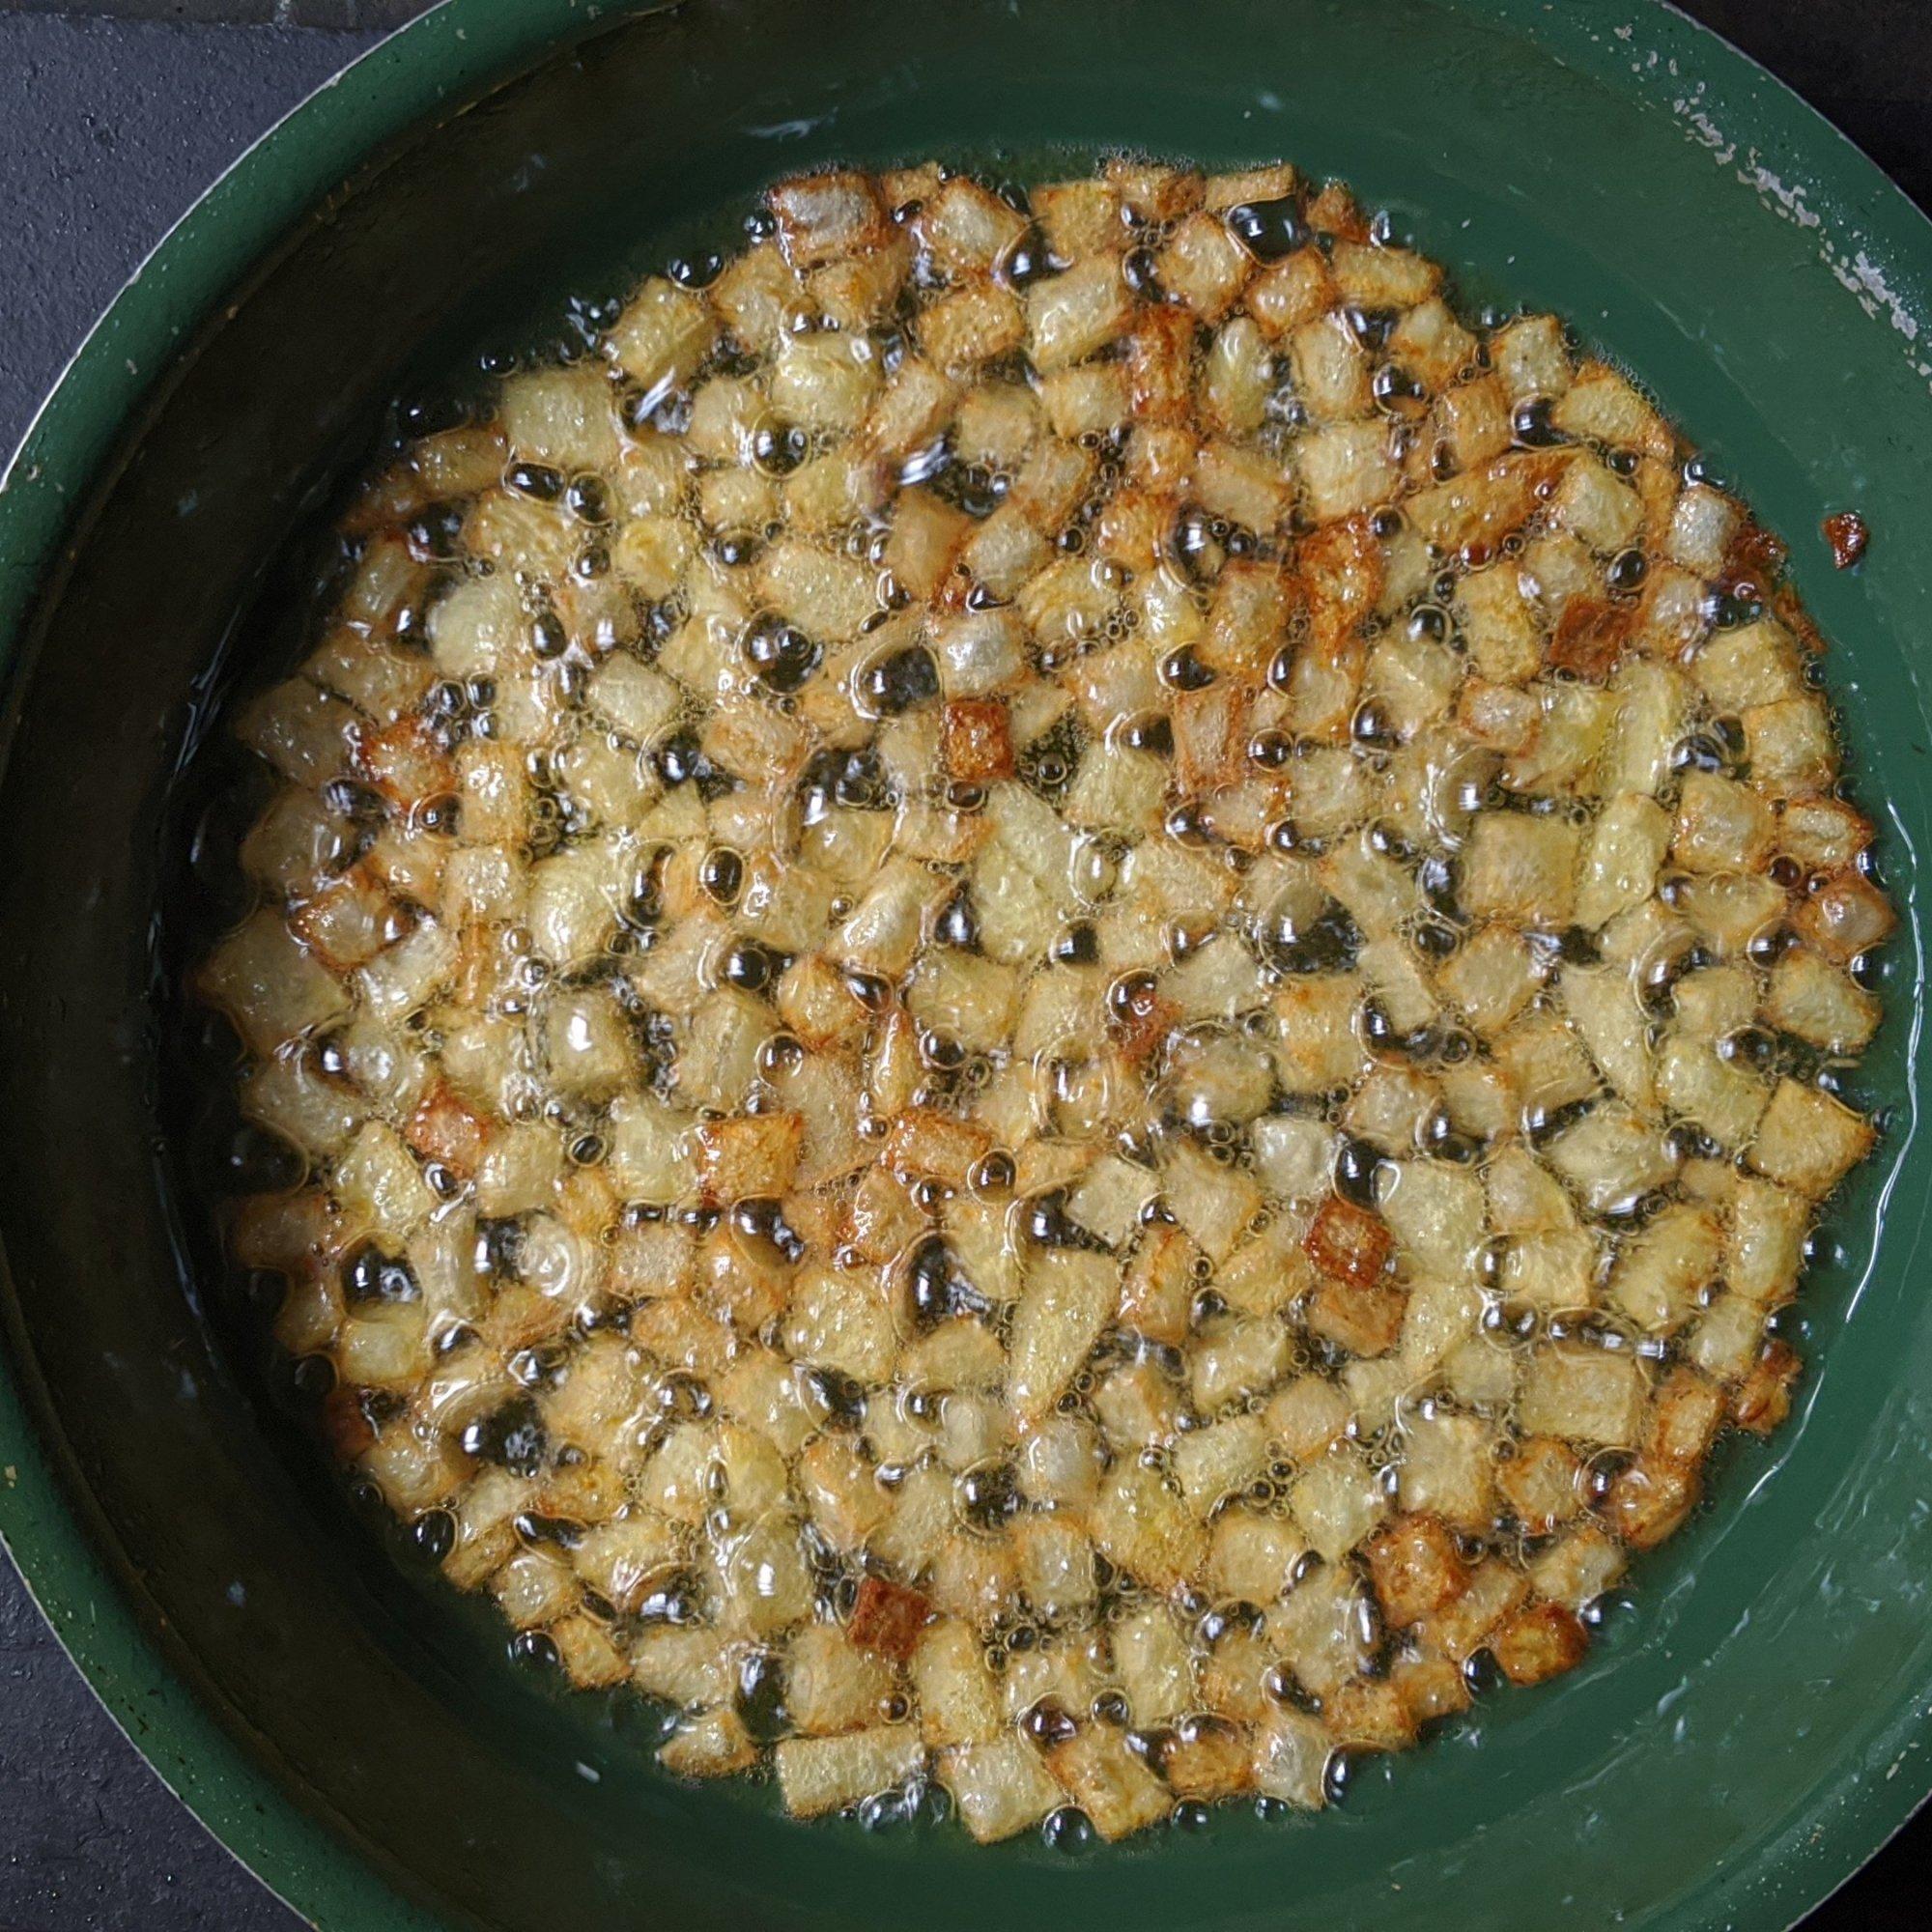 Deep fry diced potatoes